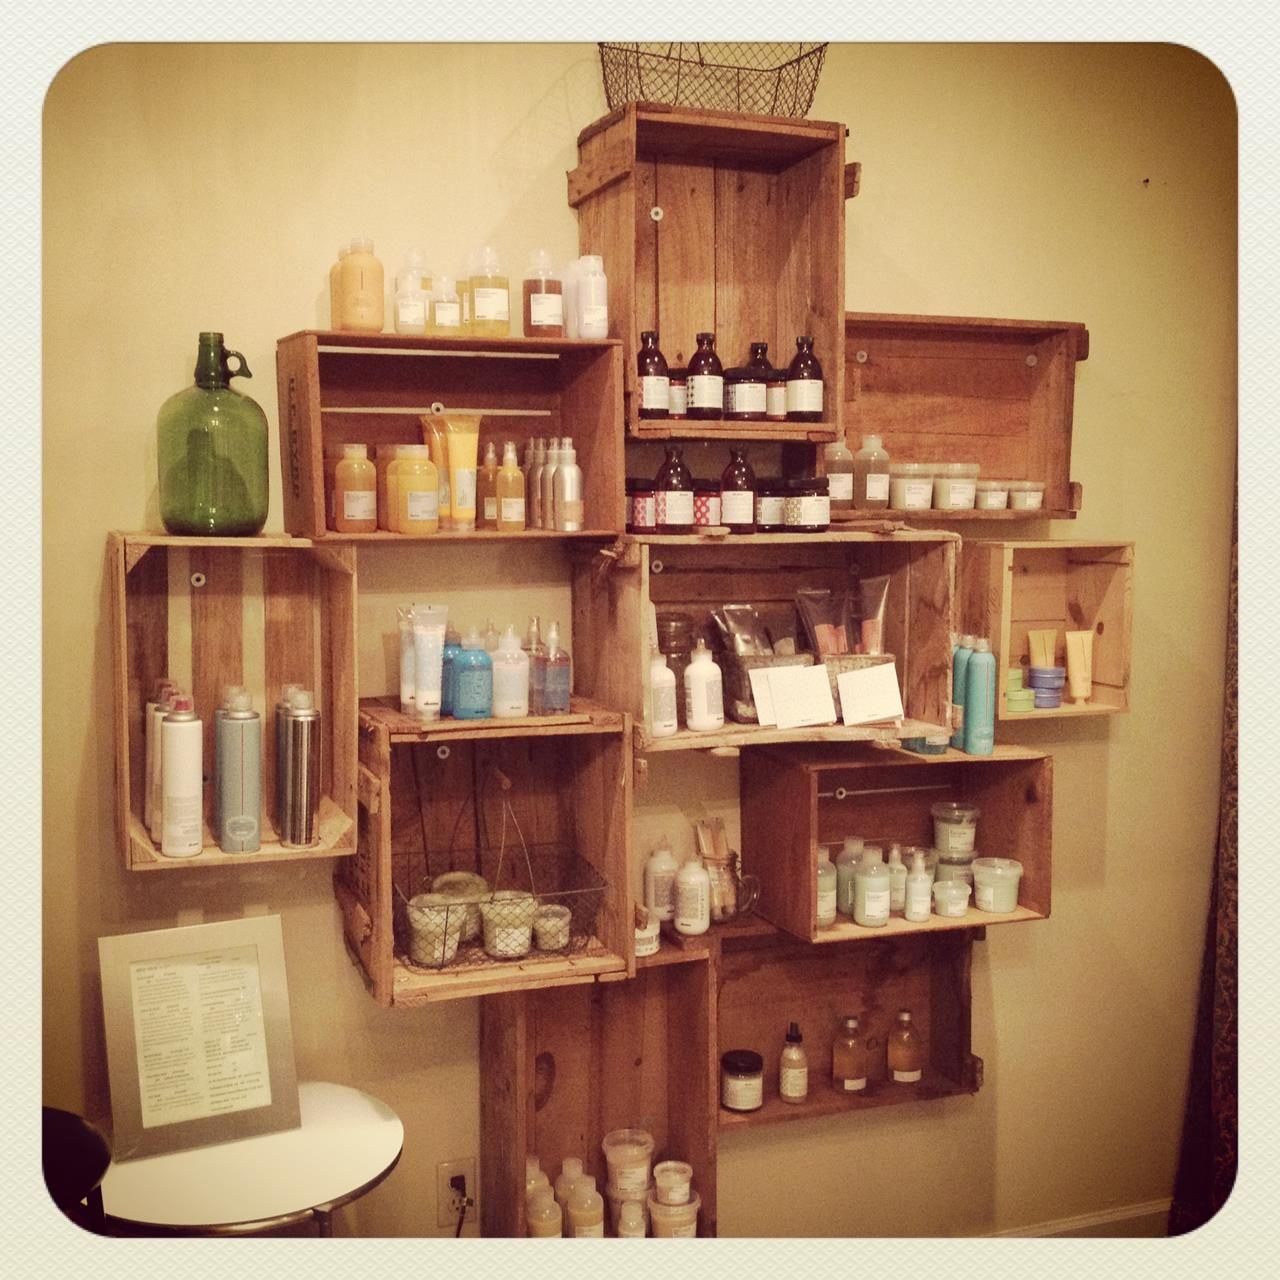 product shelf.Davines  Salon rustique, Salon chic rustique